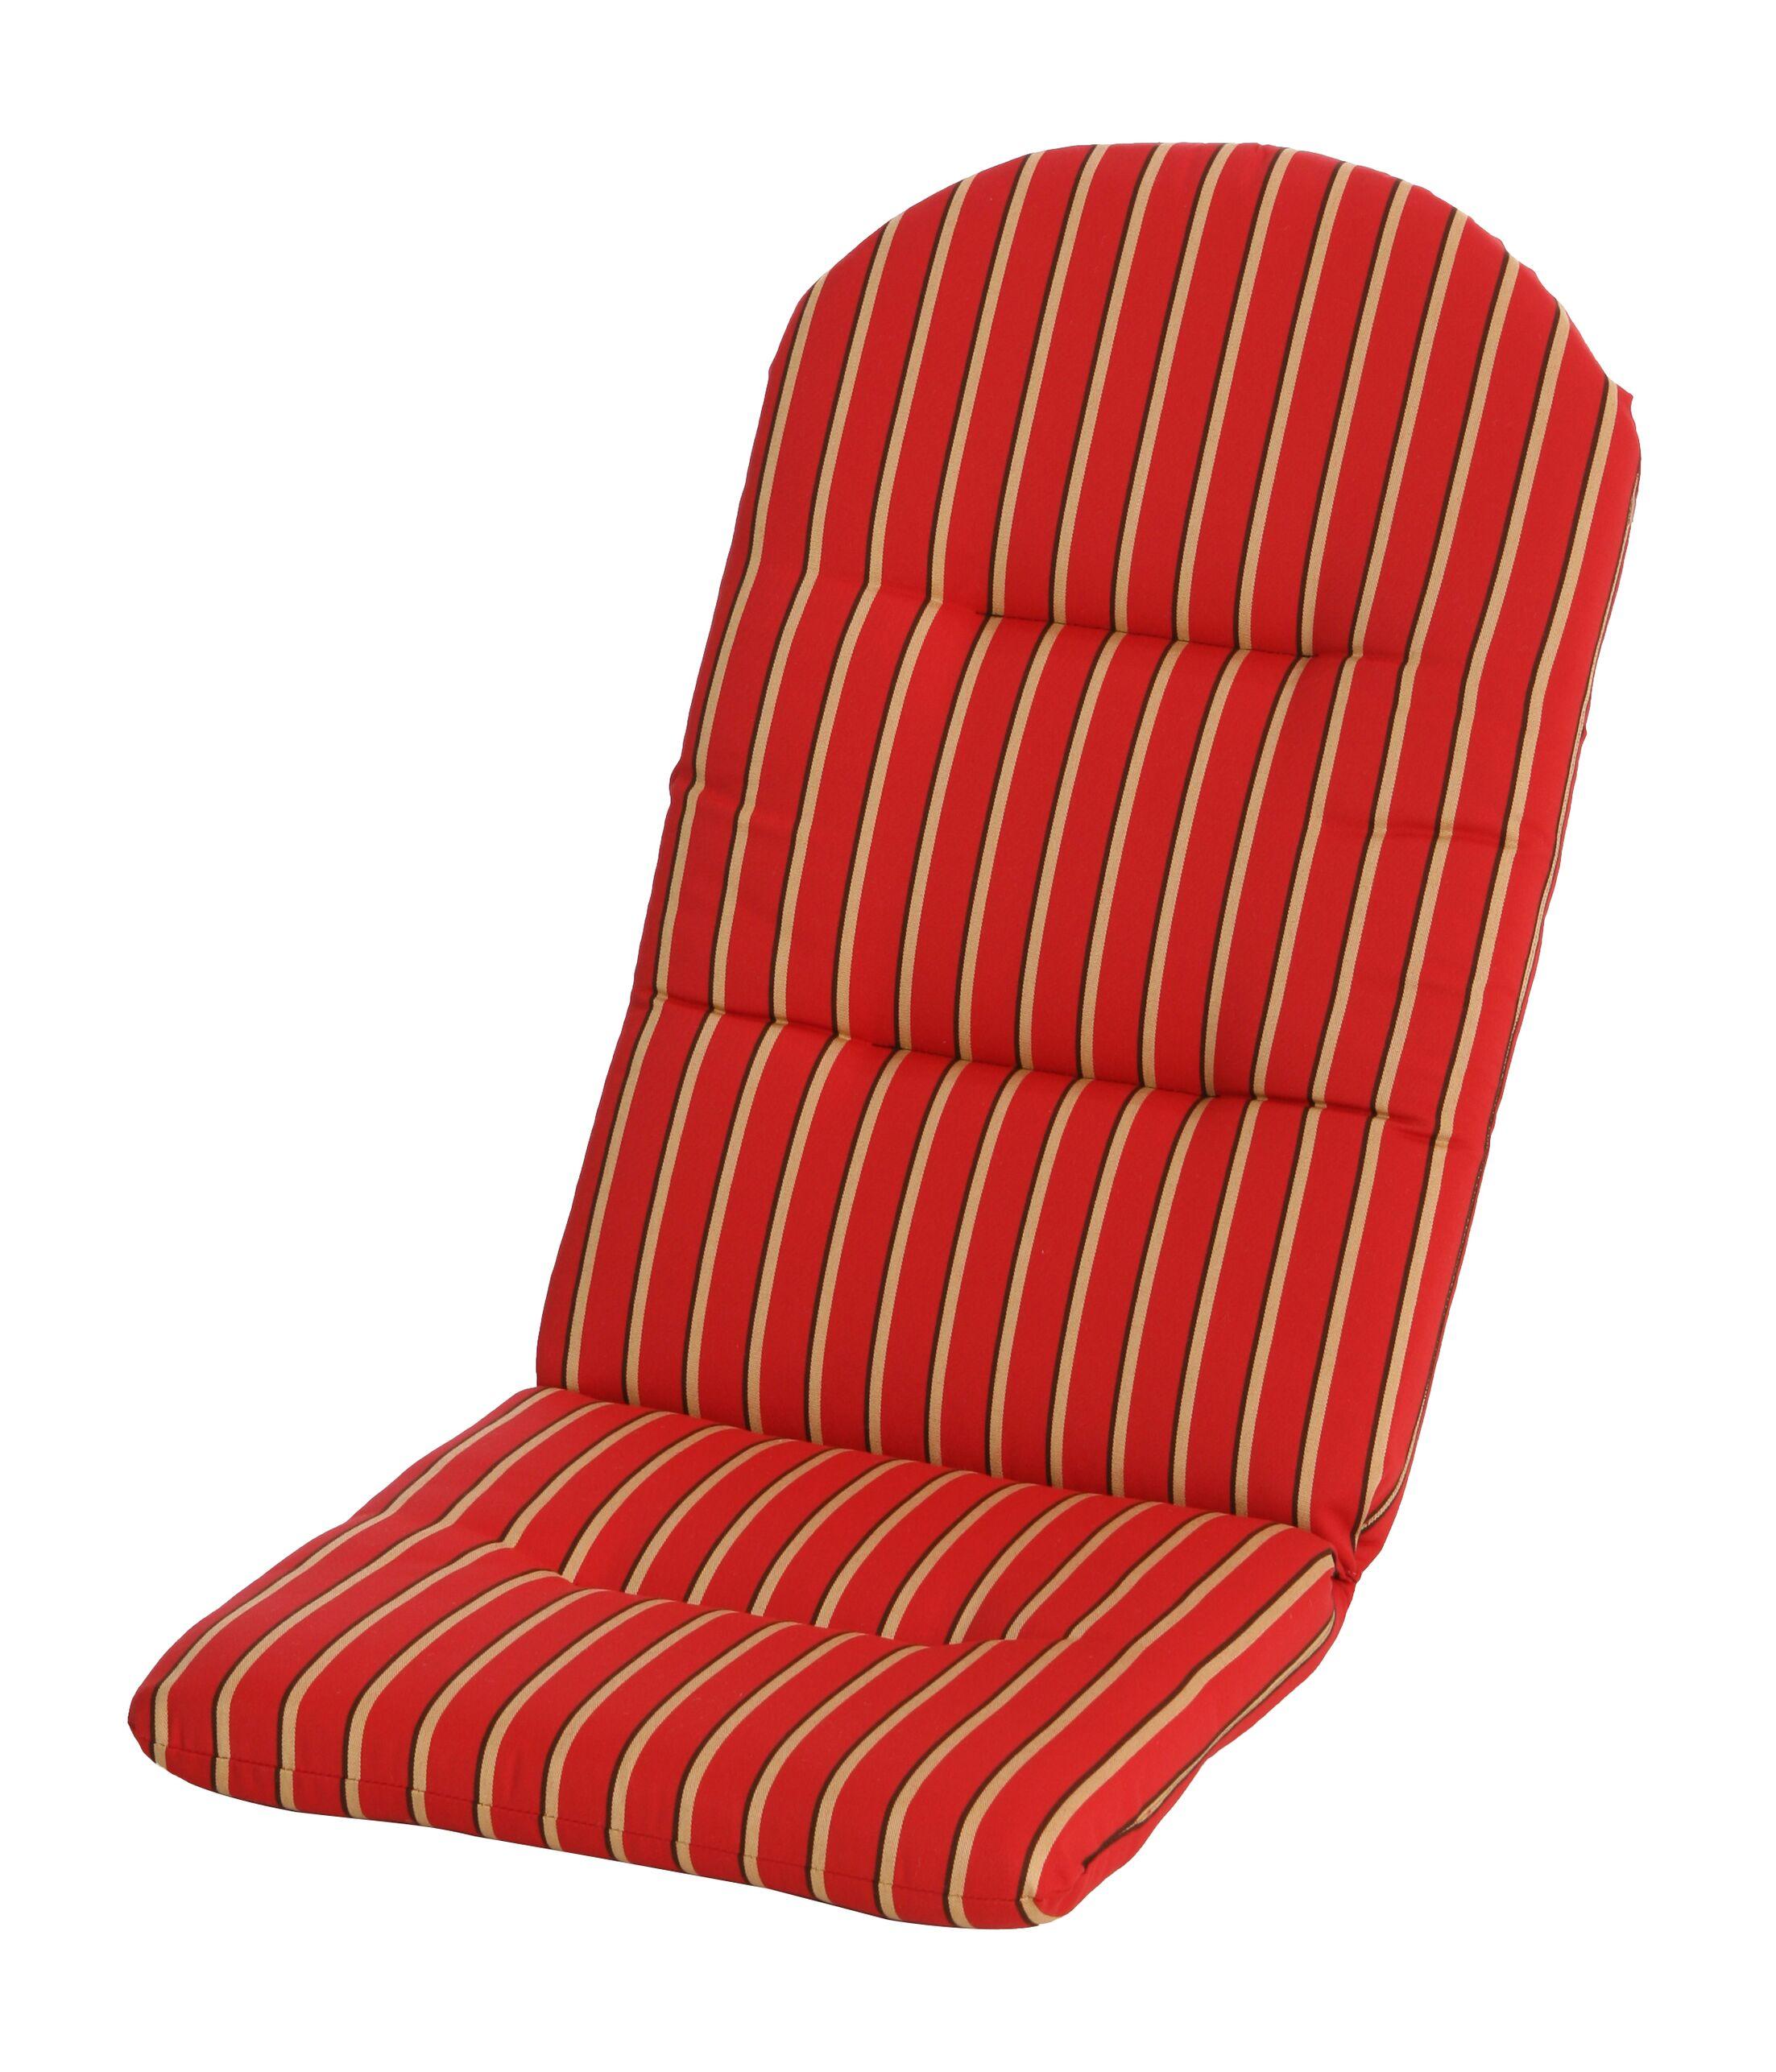 Phat Tommy Indoor/Outdoor Sunbrella Adirondack Chair Cushion Color: Crimson